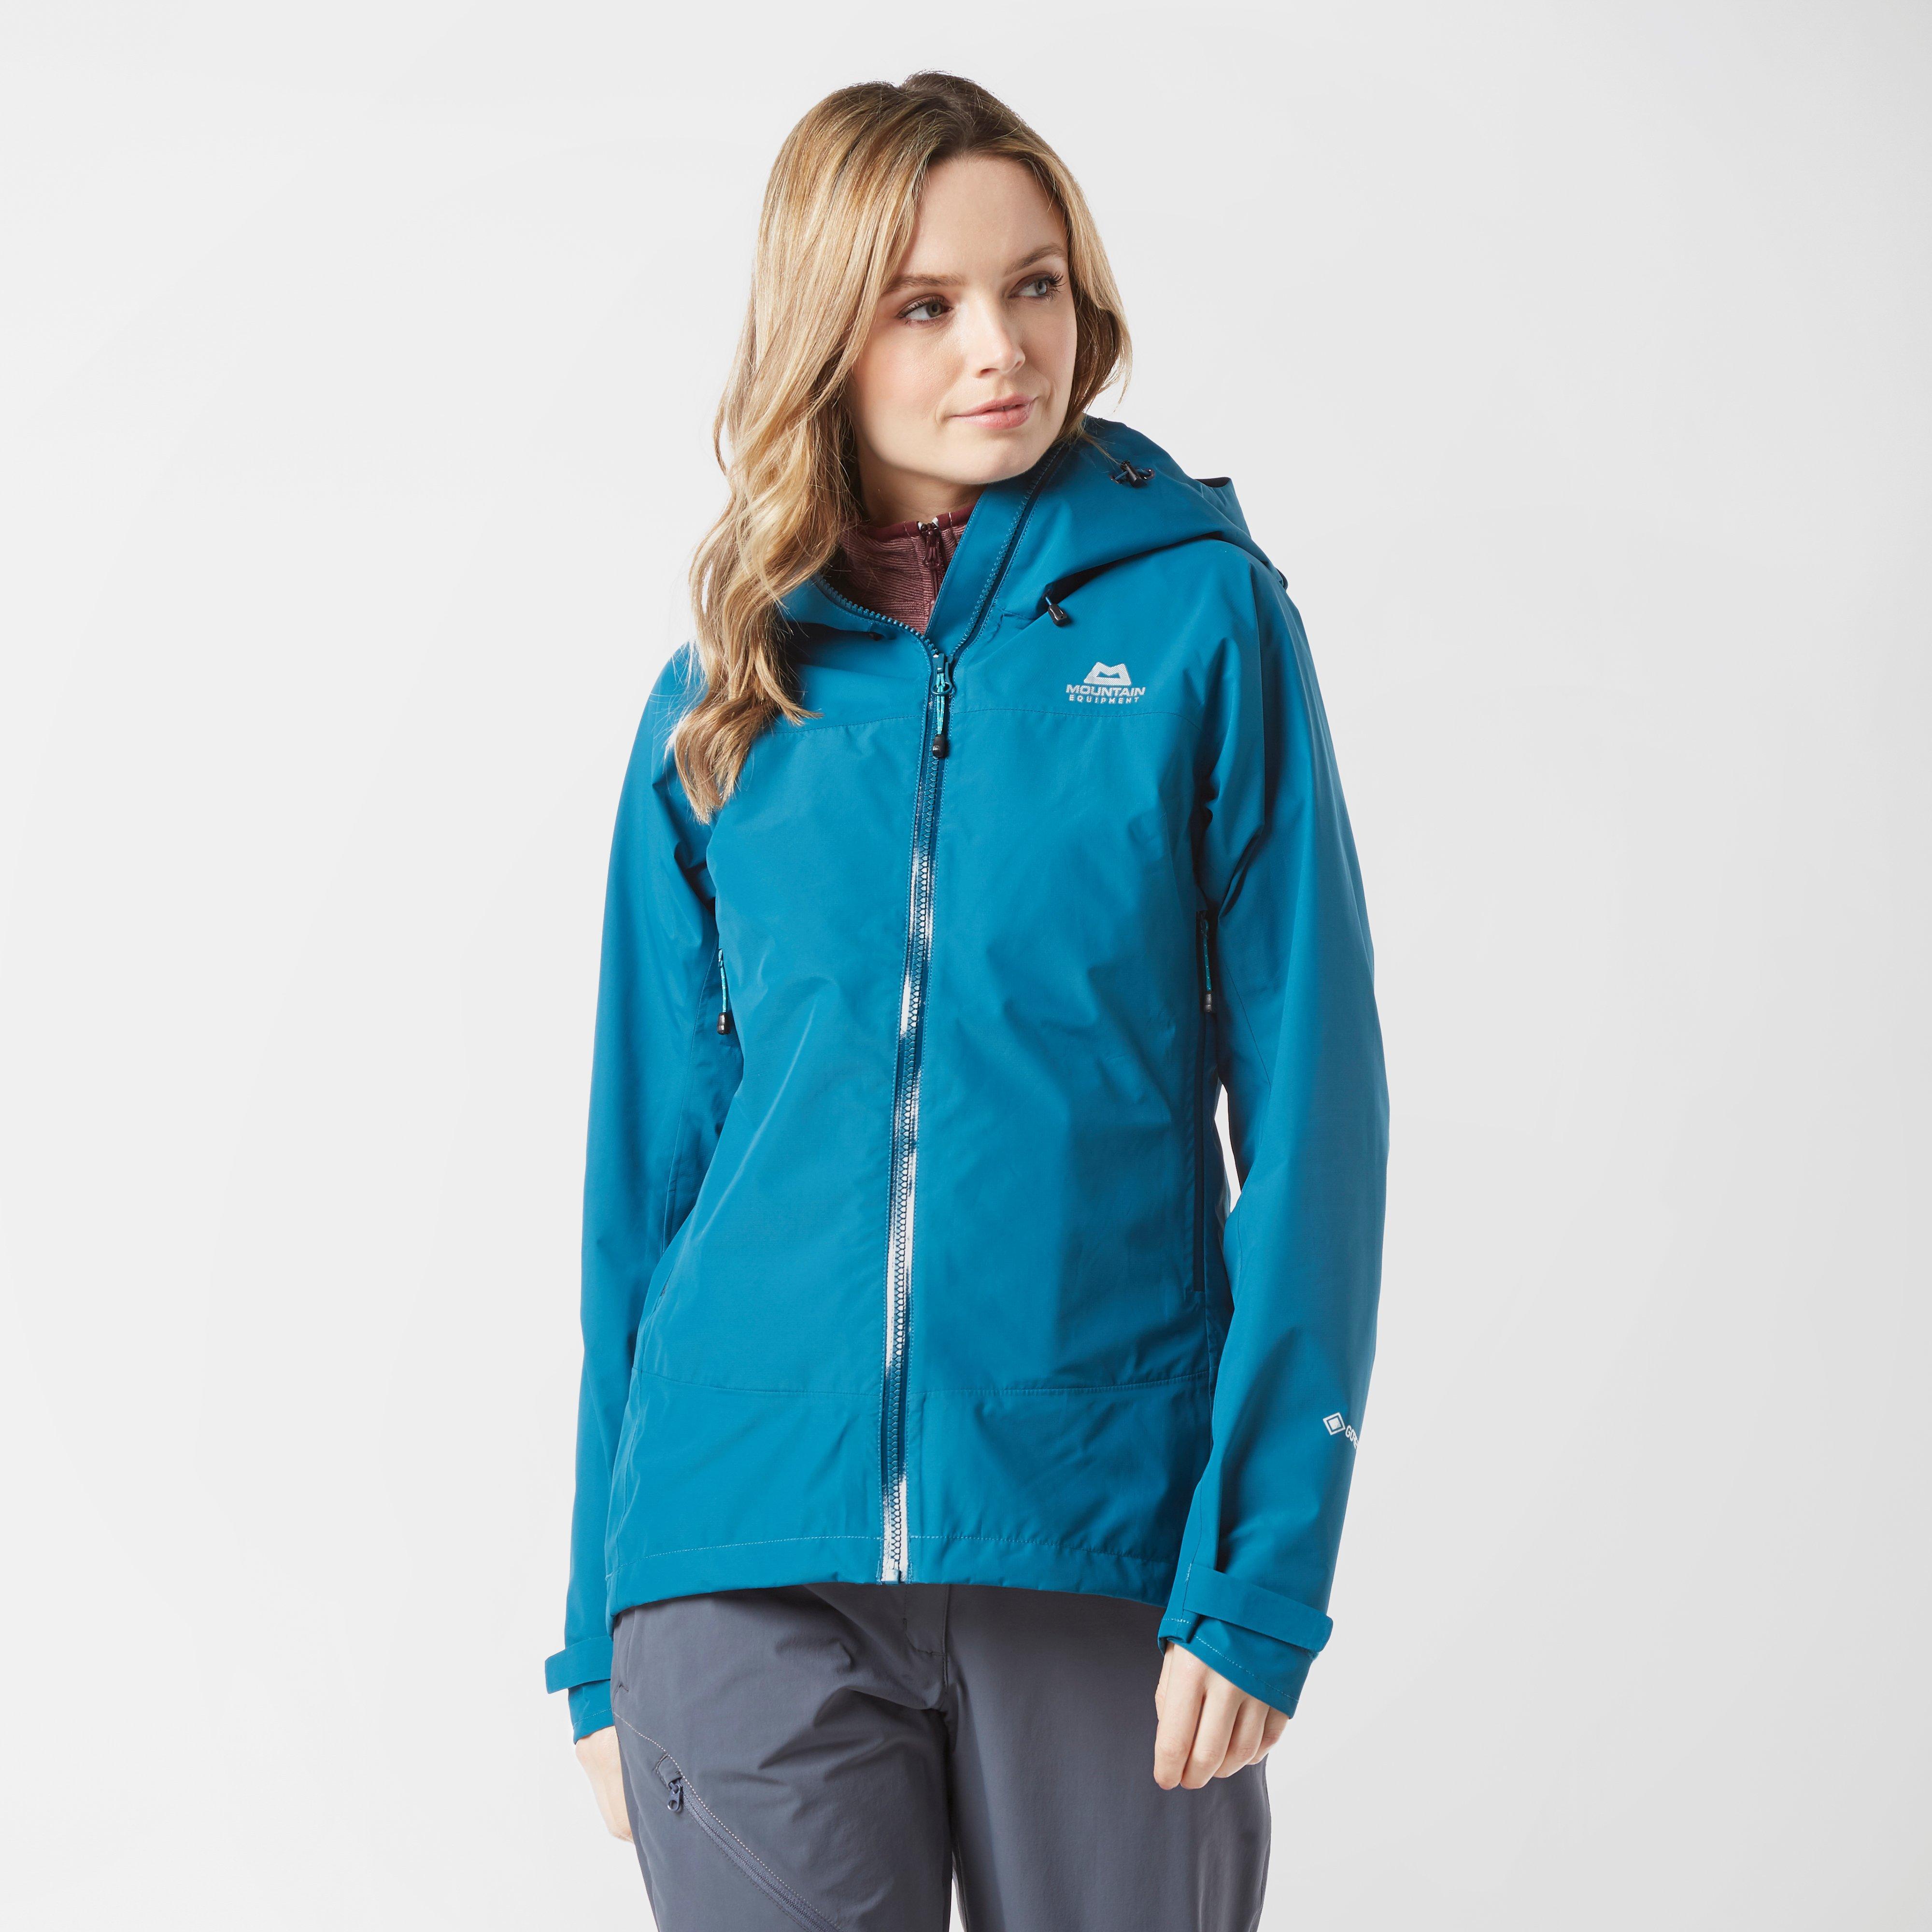 Mountain Equipment Women's Garwhal GORE-TEX Jacket, Blue